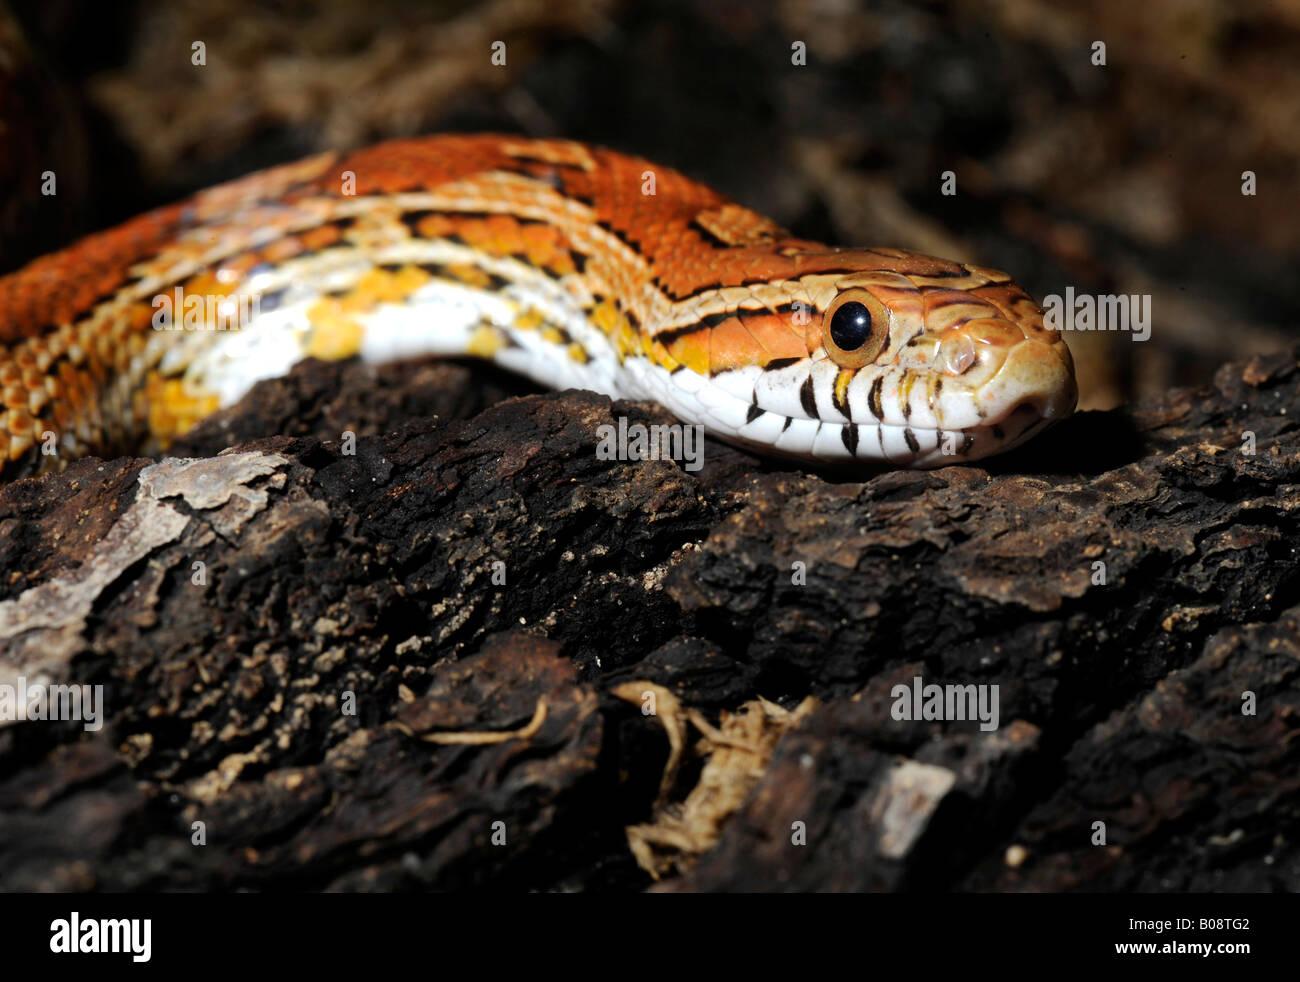 Corn Snake (Elaphe guttata guttata) - Stock Image